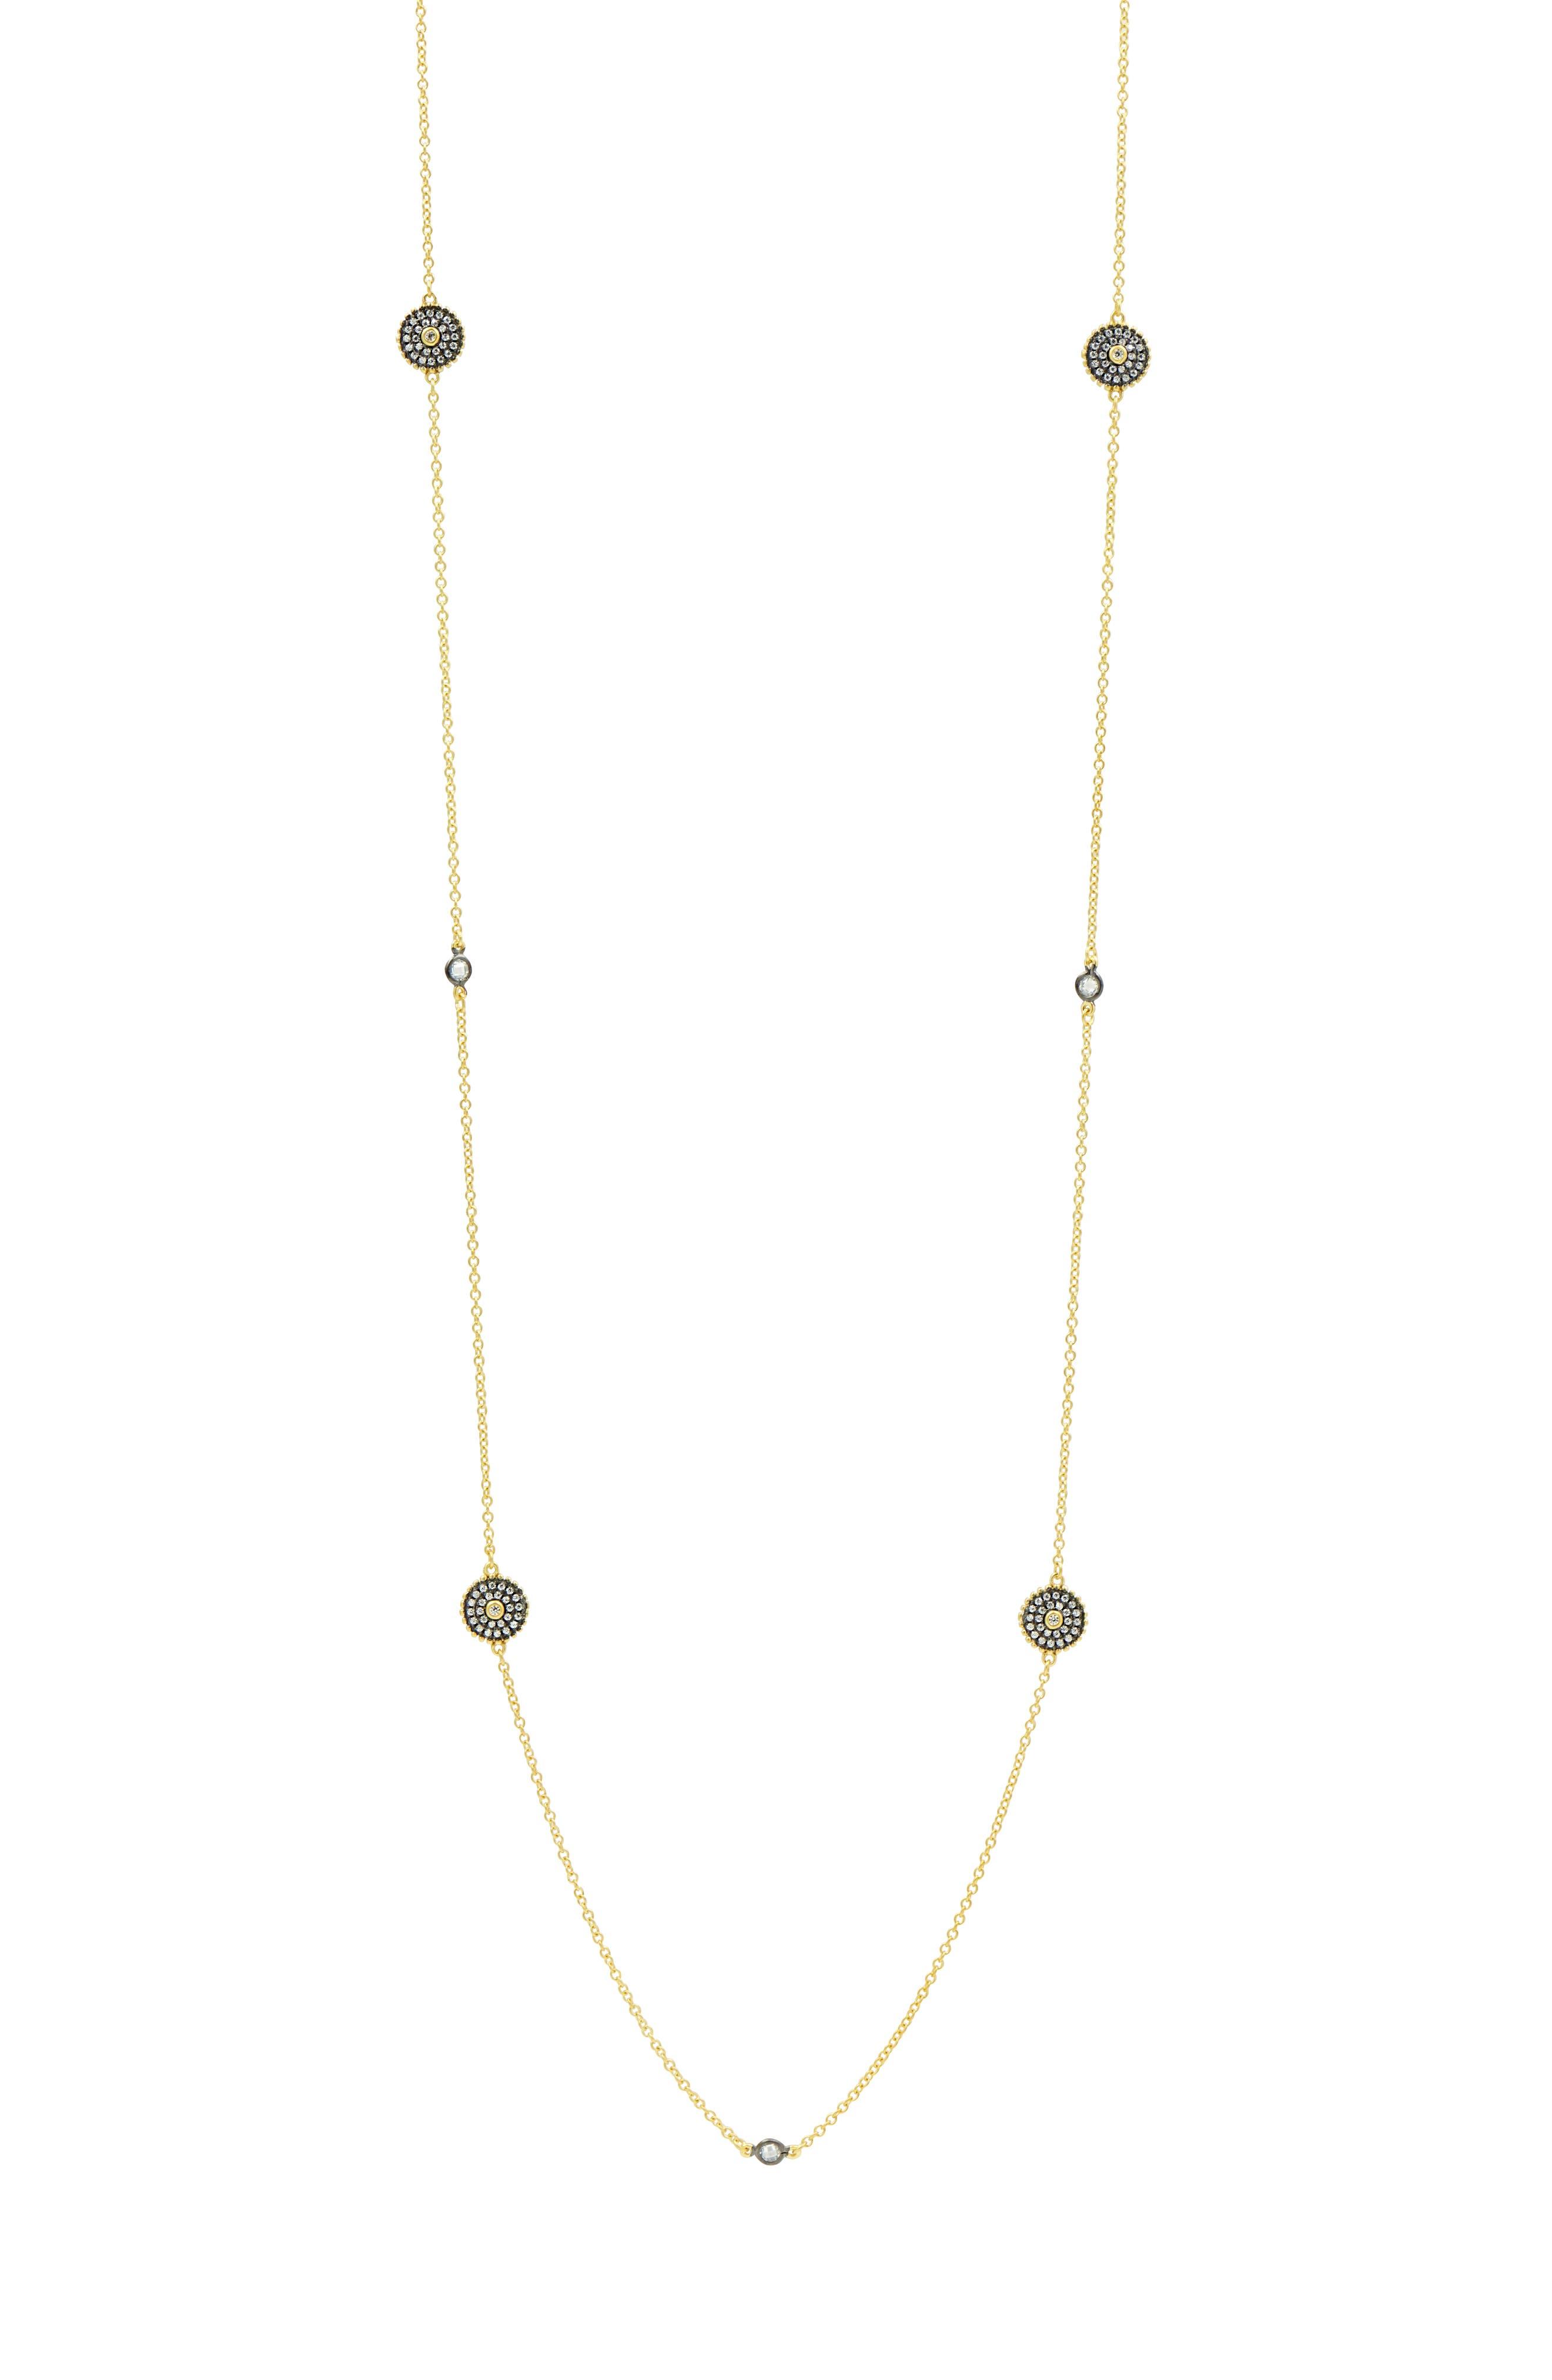 Double-Sided Pavé Disc Station Necklace,                             Alternate thumbnail 4, color,                             BLACK/ WHITE/ GOLD